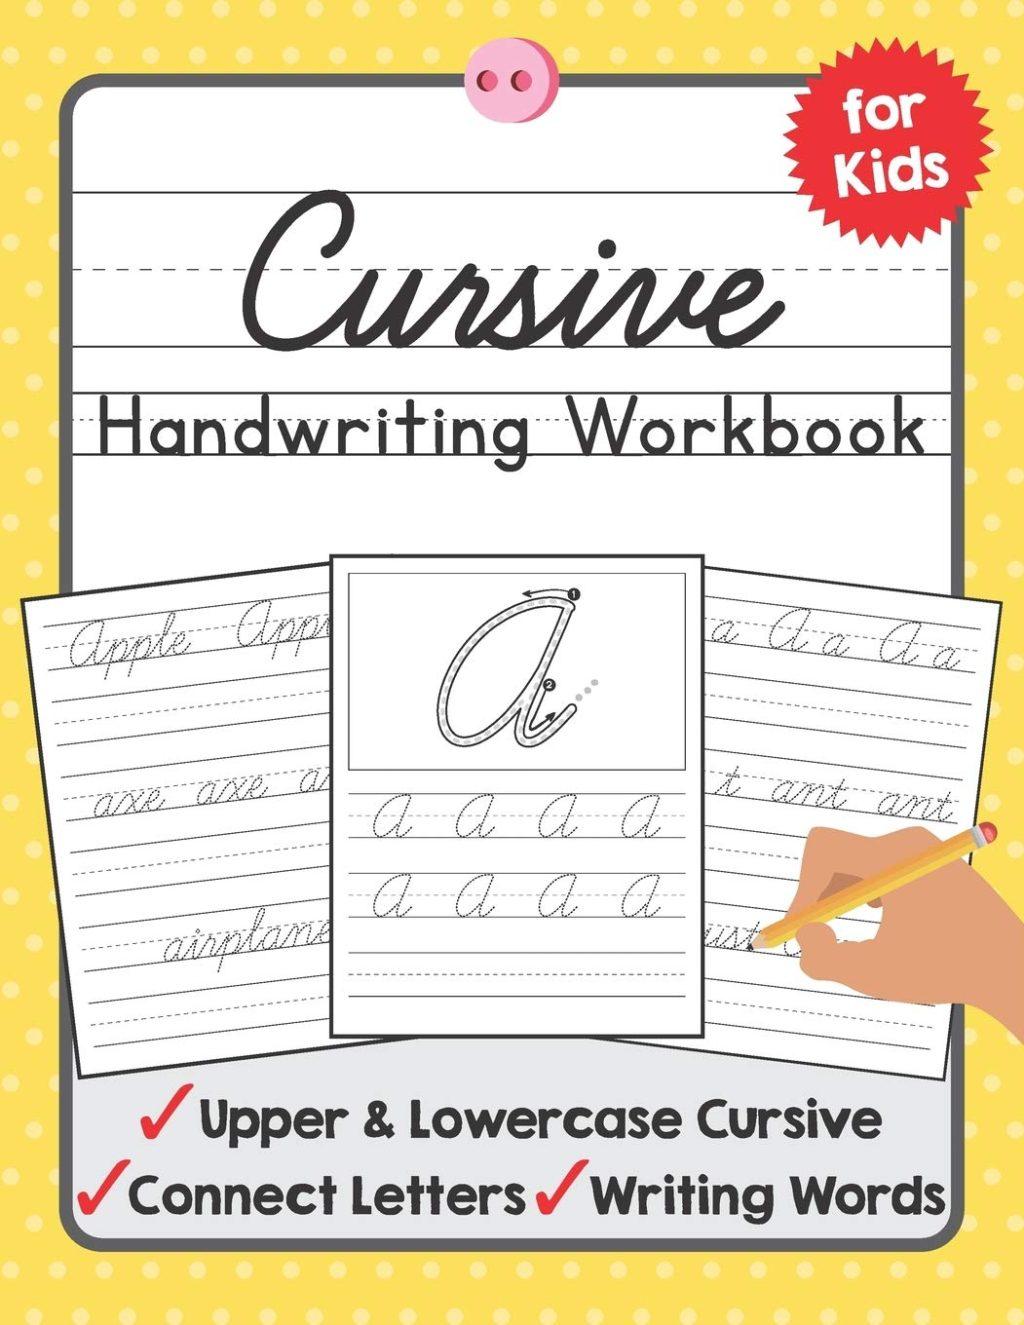 Math Worksheet ~ Cursive Handwriting Workbook For Kids